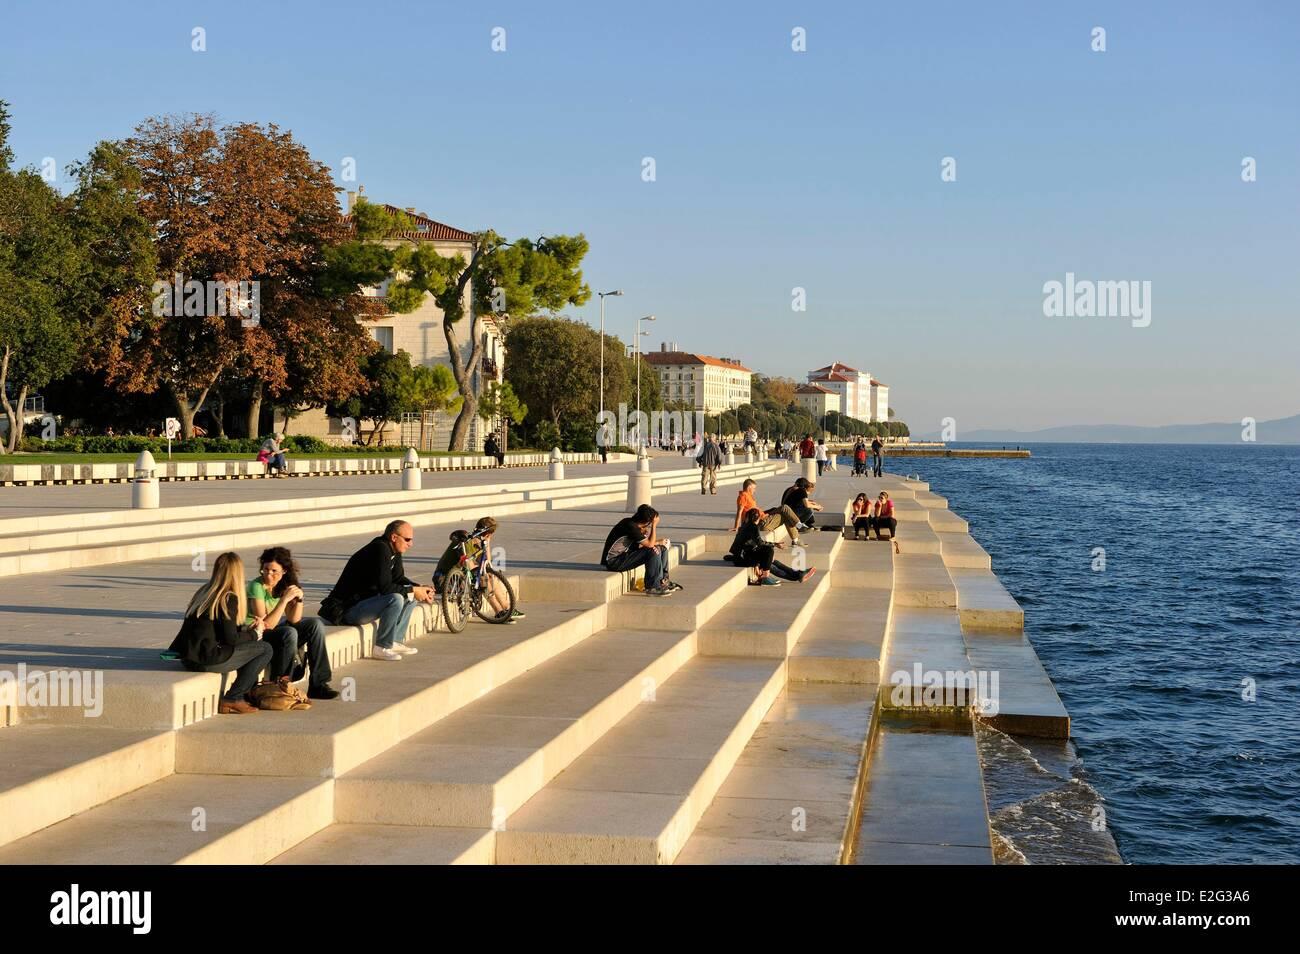 Croatia Dalmatia Dalmatian coast Zadar Sea organ architectural musical instrument created by Nikola Basic - Stock Image